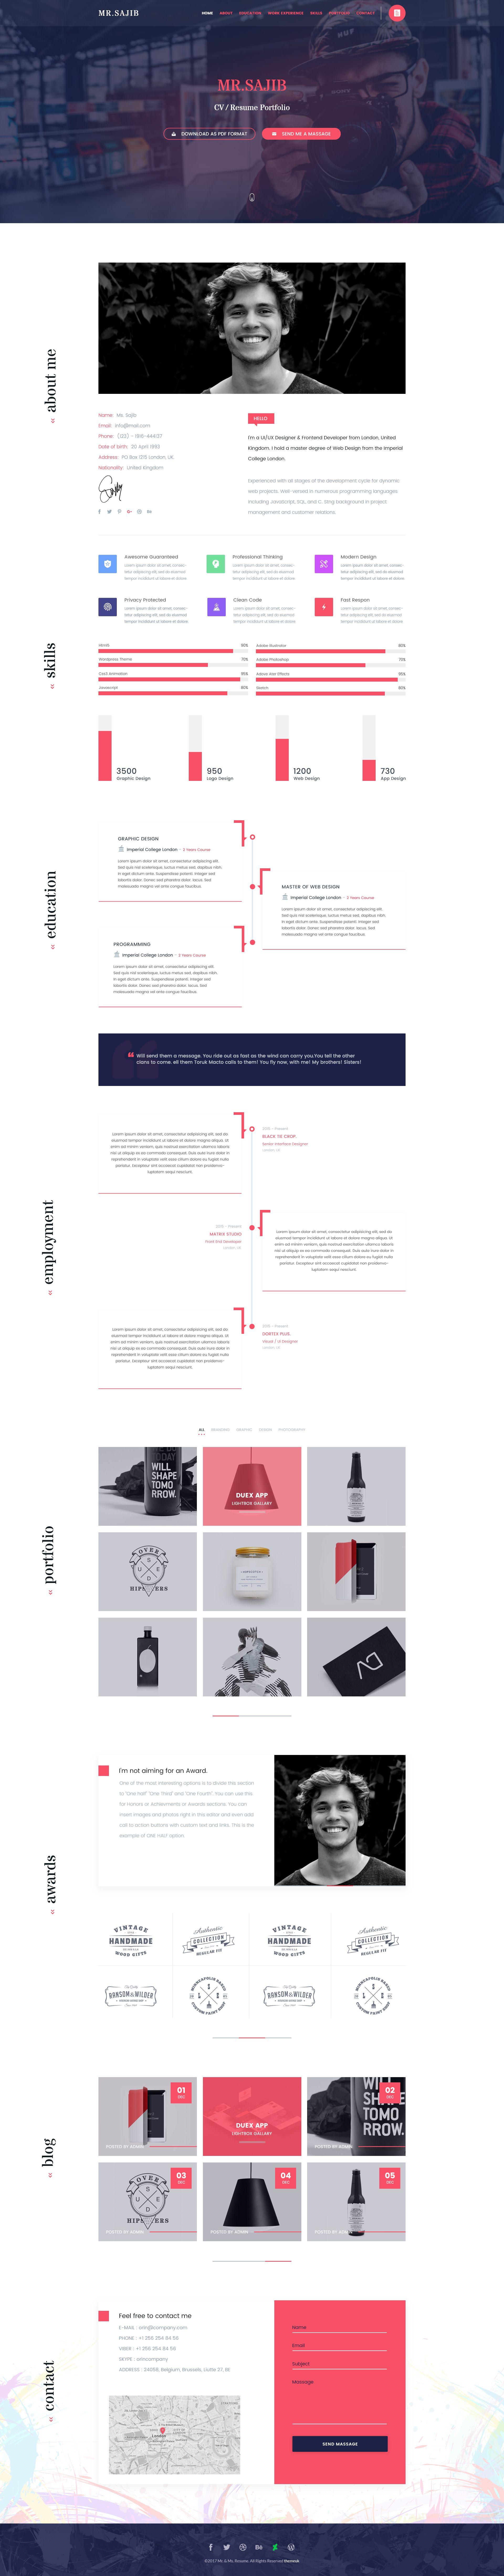 Mr. & Ms. Resume PSD Template | Psd templates, Resume cv and Ux designer